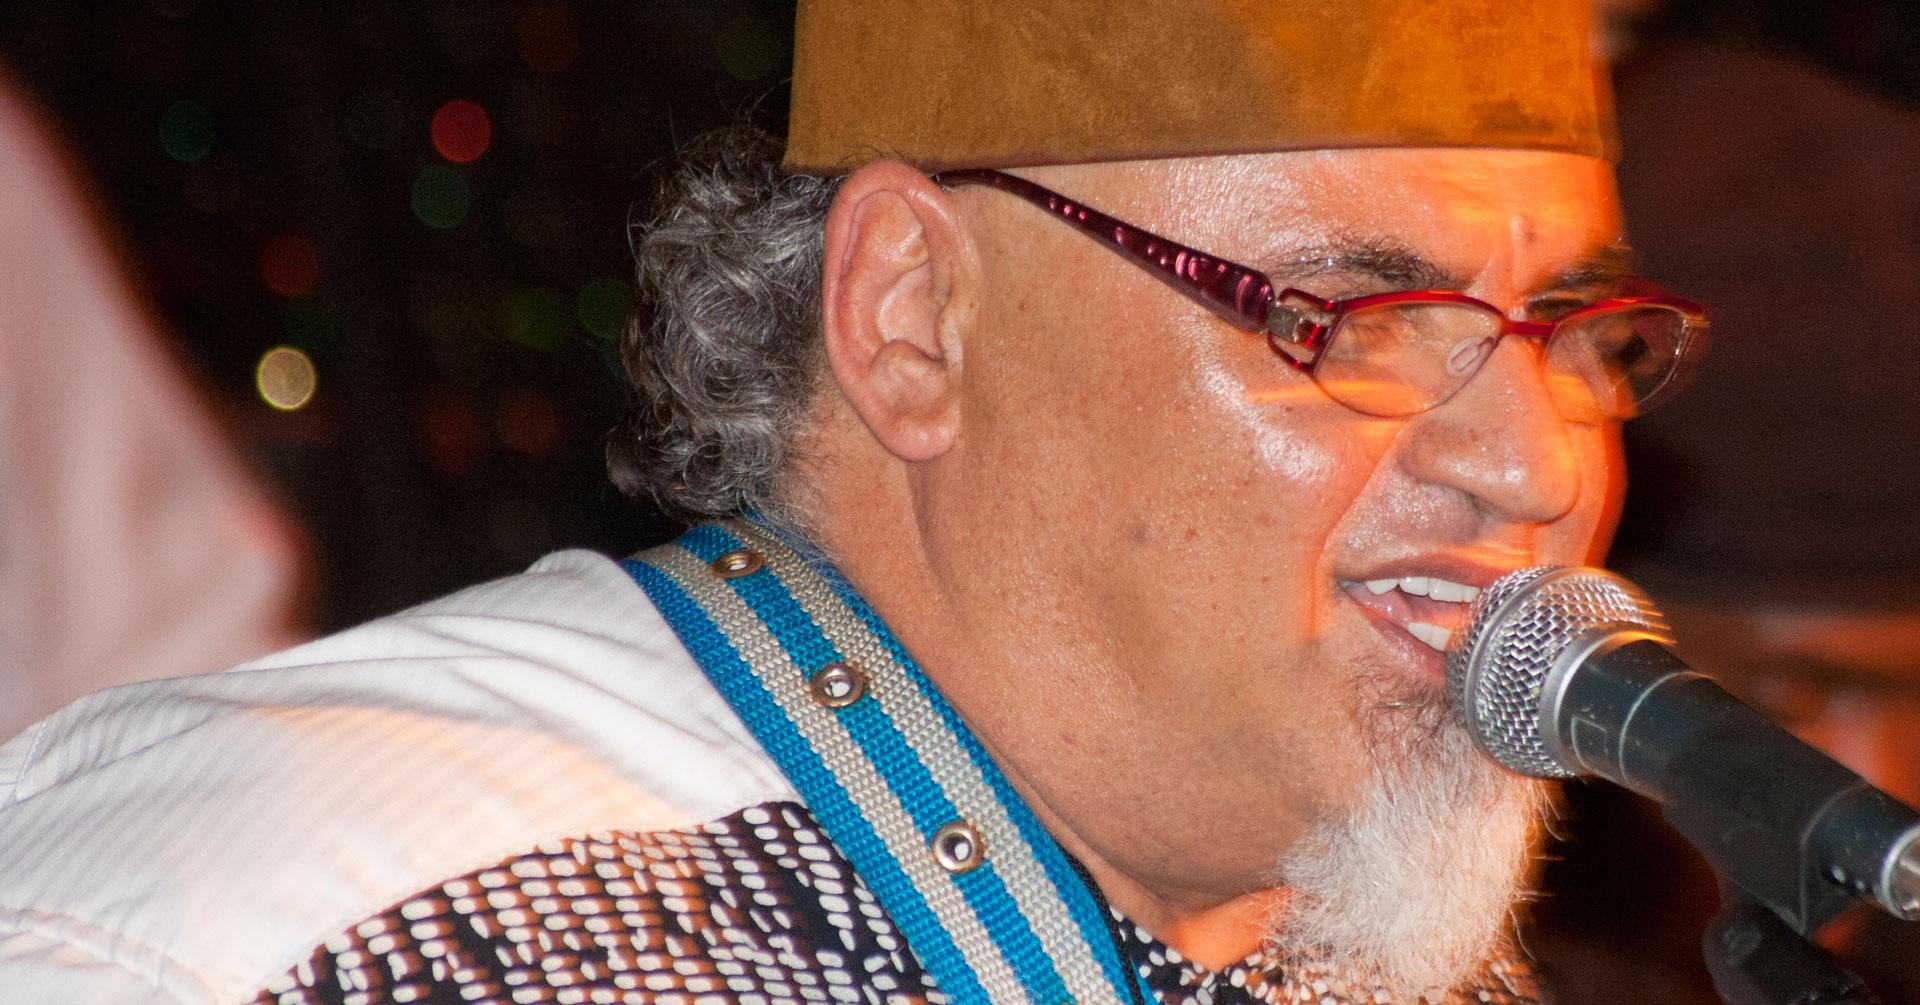 Samba Squad at Lula-Lounge: Rick Shadrach Lazar